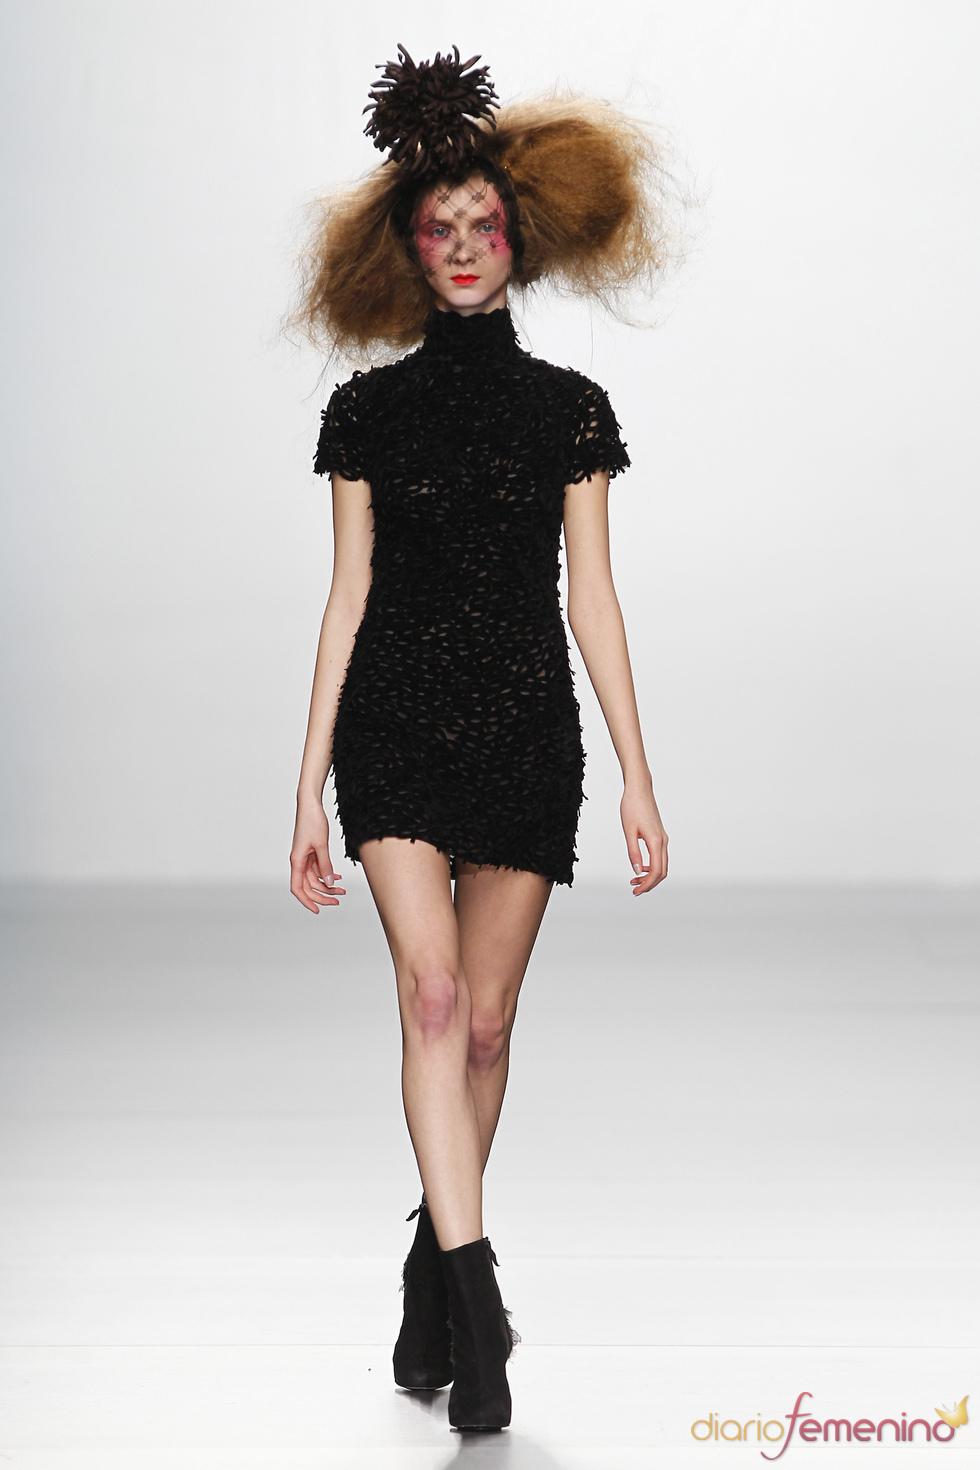 Little Black Dress. Elisa Palomino O/I 2011-12. Cibeles Madrid Fashion Week